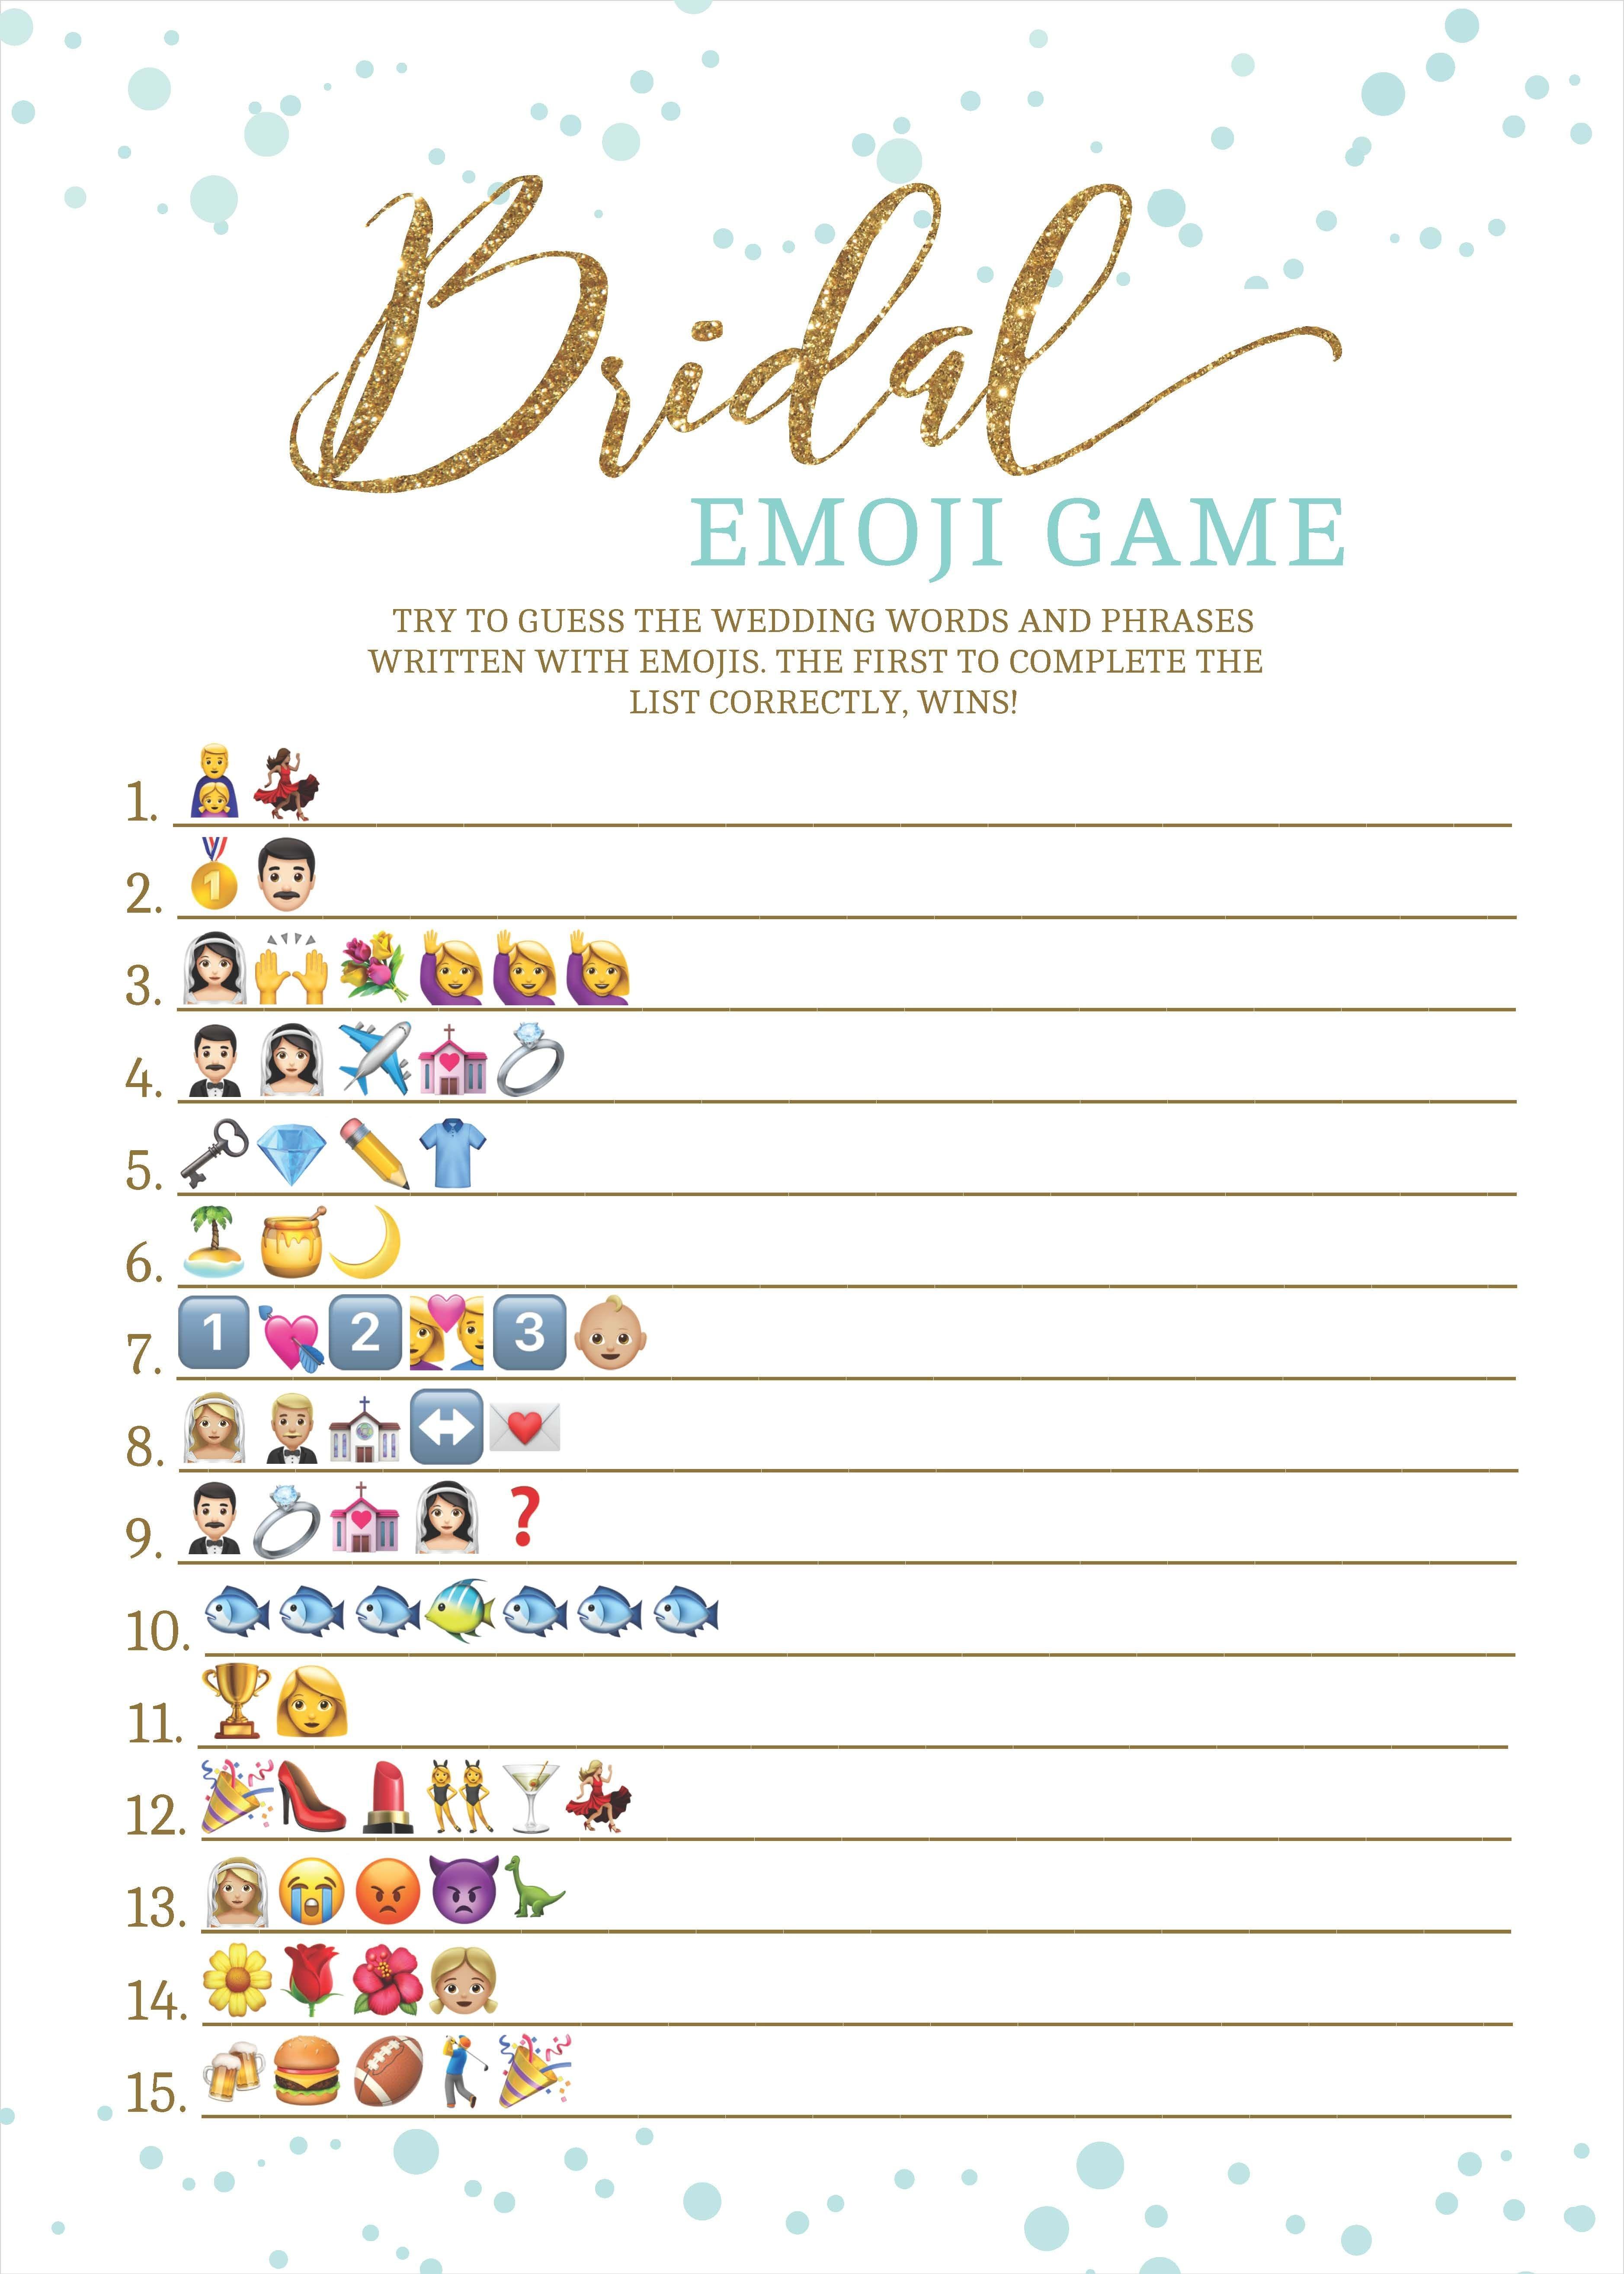 Bridal Shower, Bachelorette, Hen Party, Bridal Game, Emoji - Wedding Emoji Pictionary Free Printable